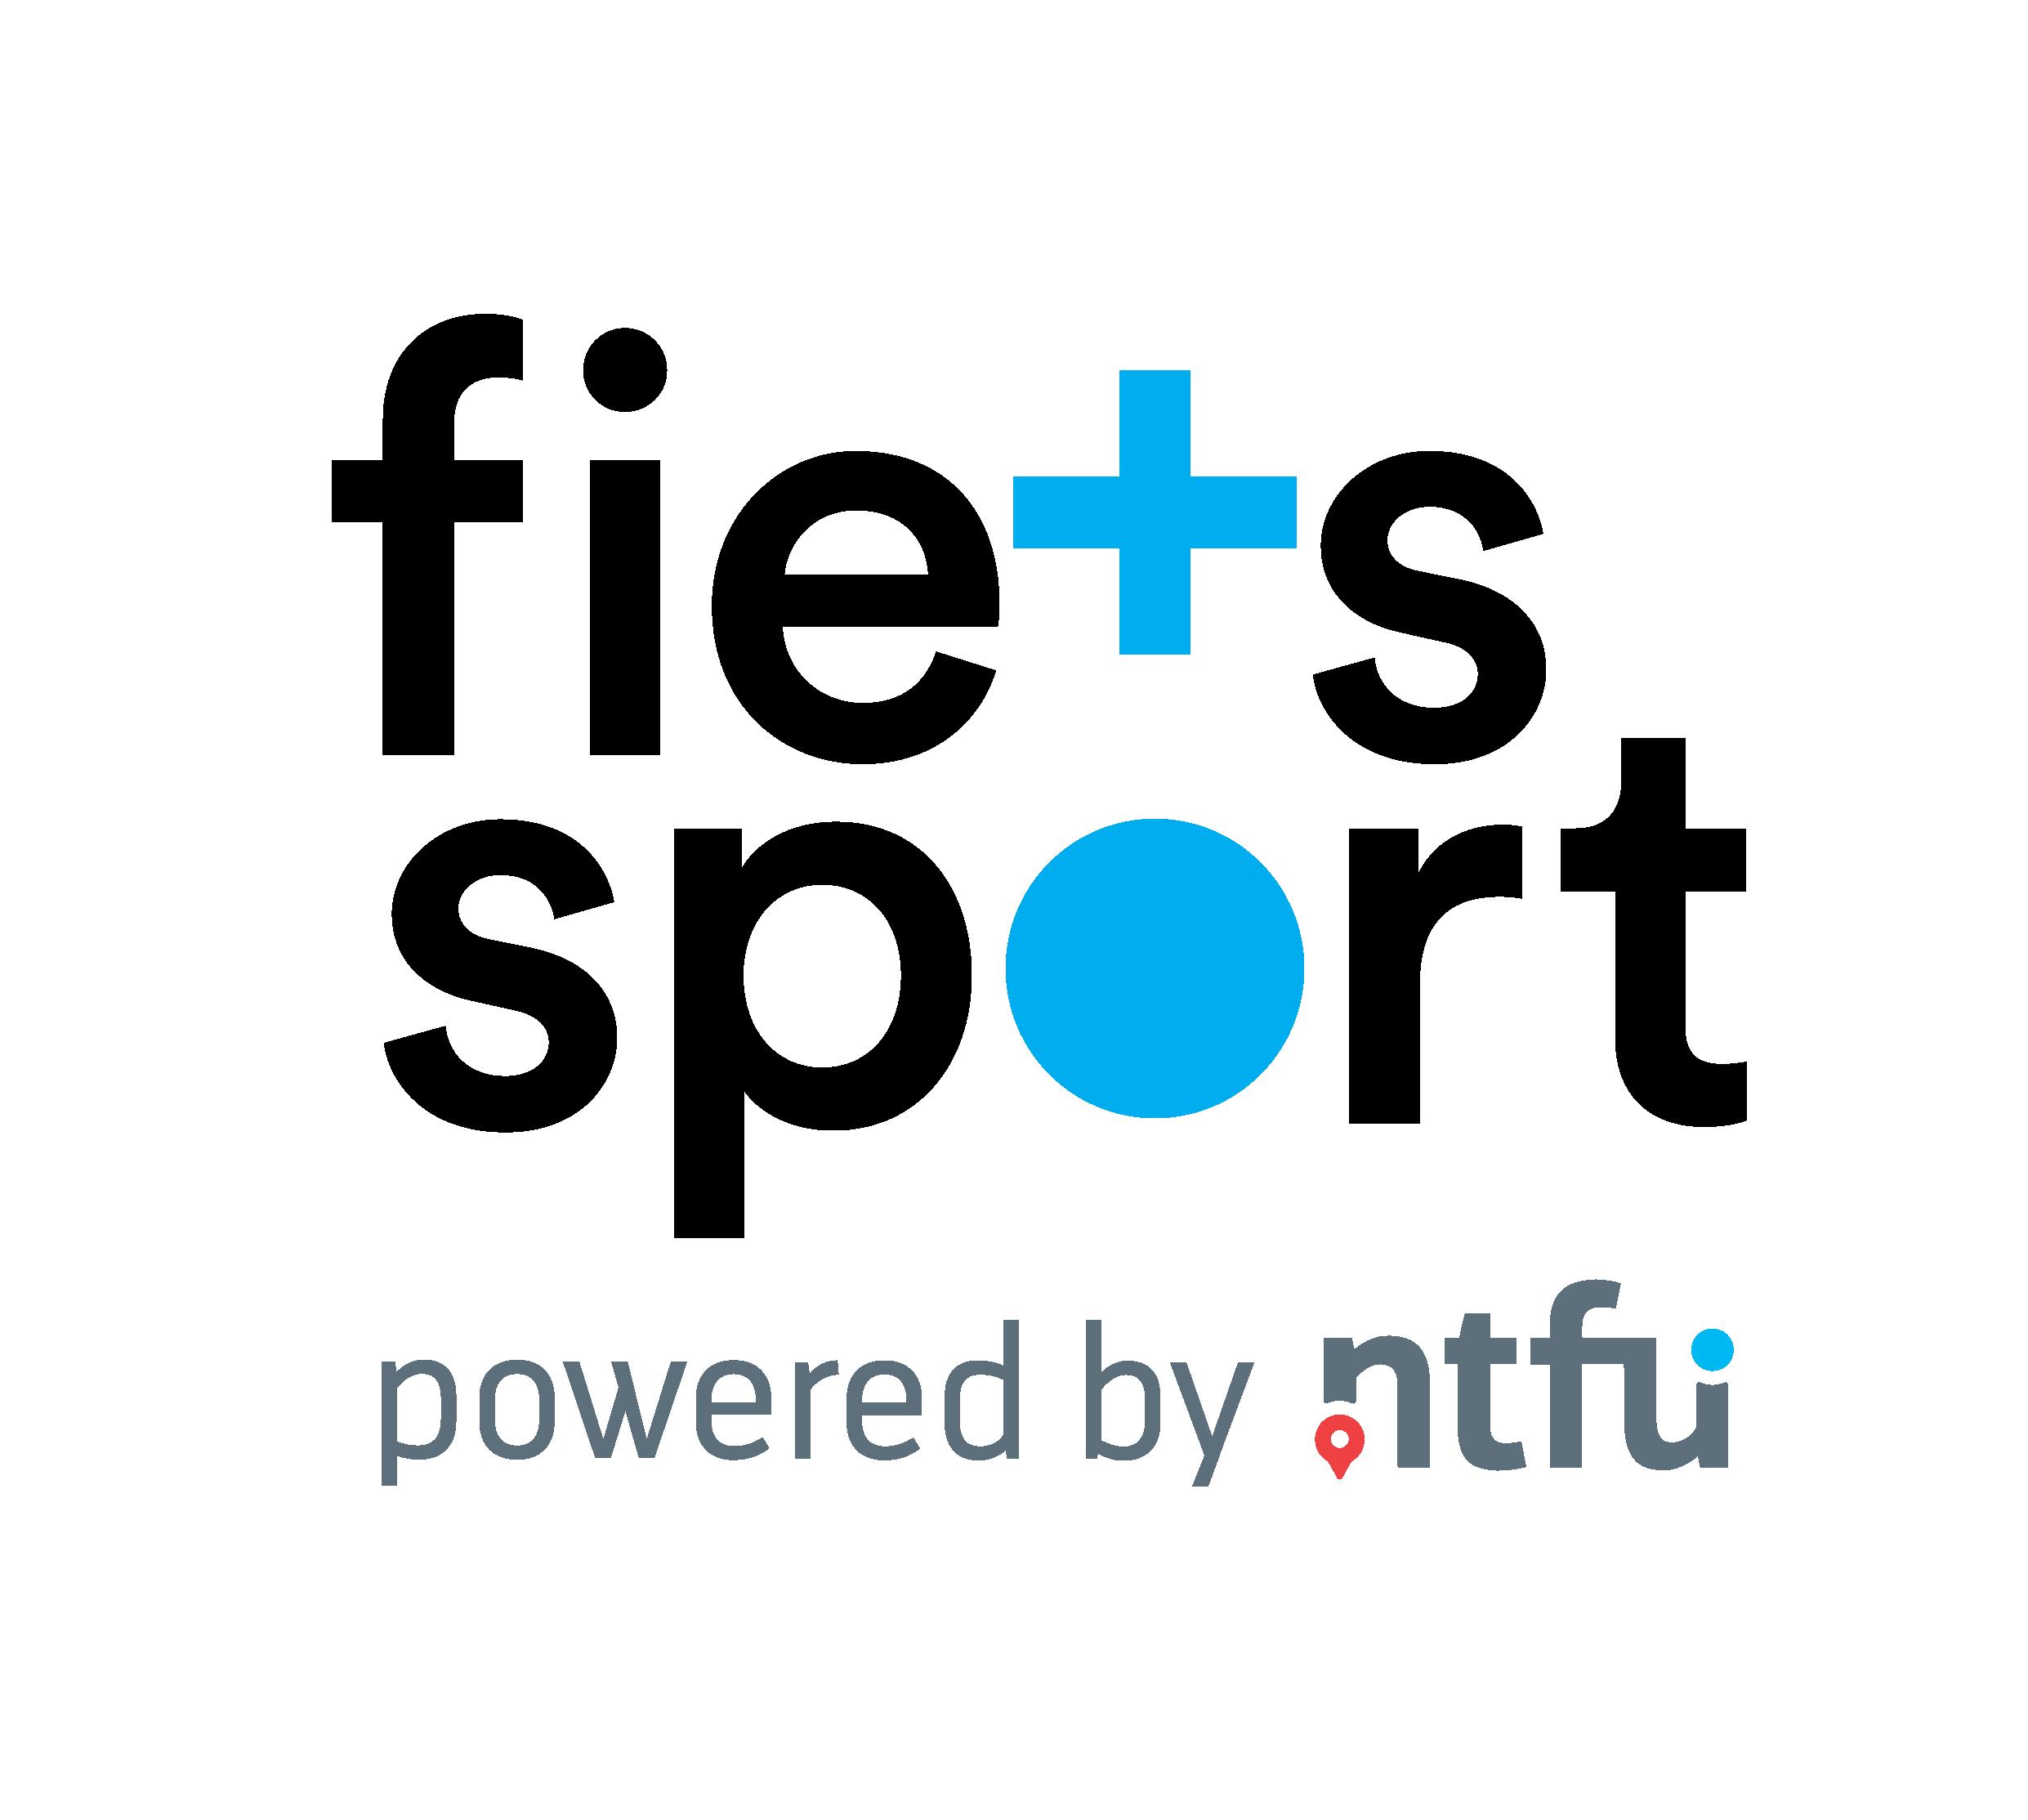 FS-powered_by_NTFU-b (1)